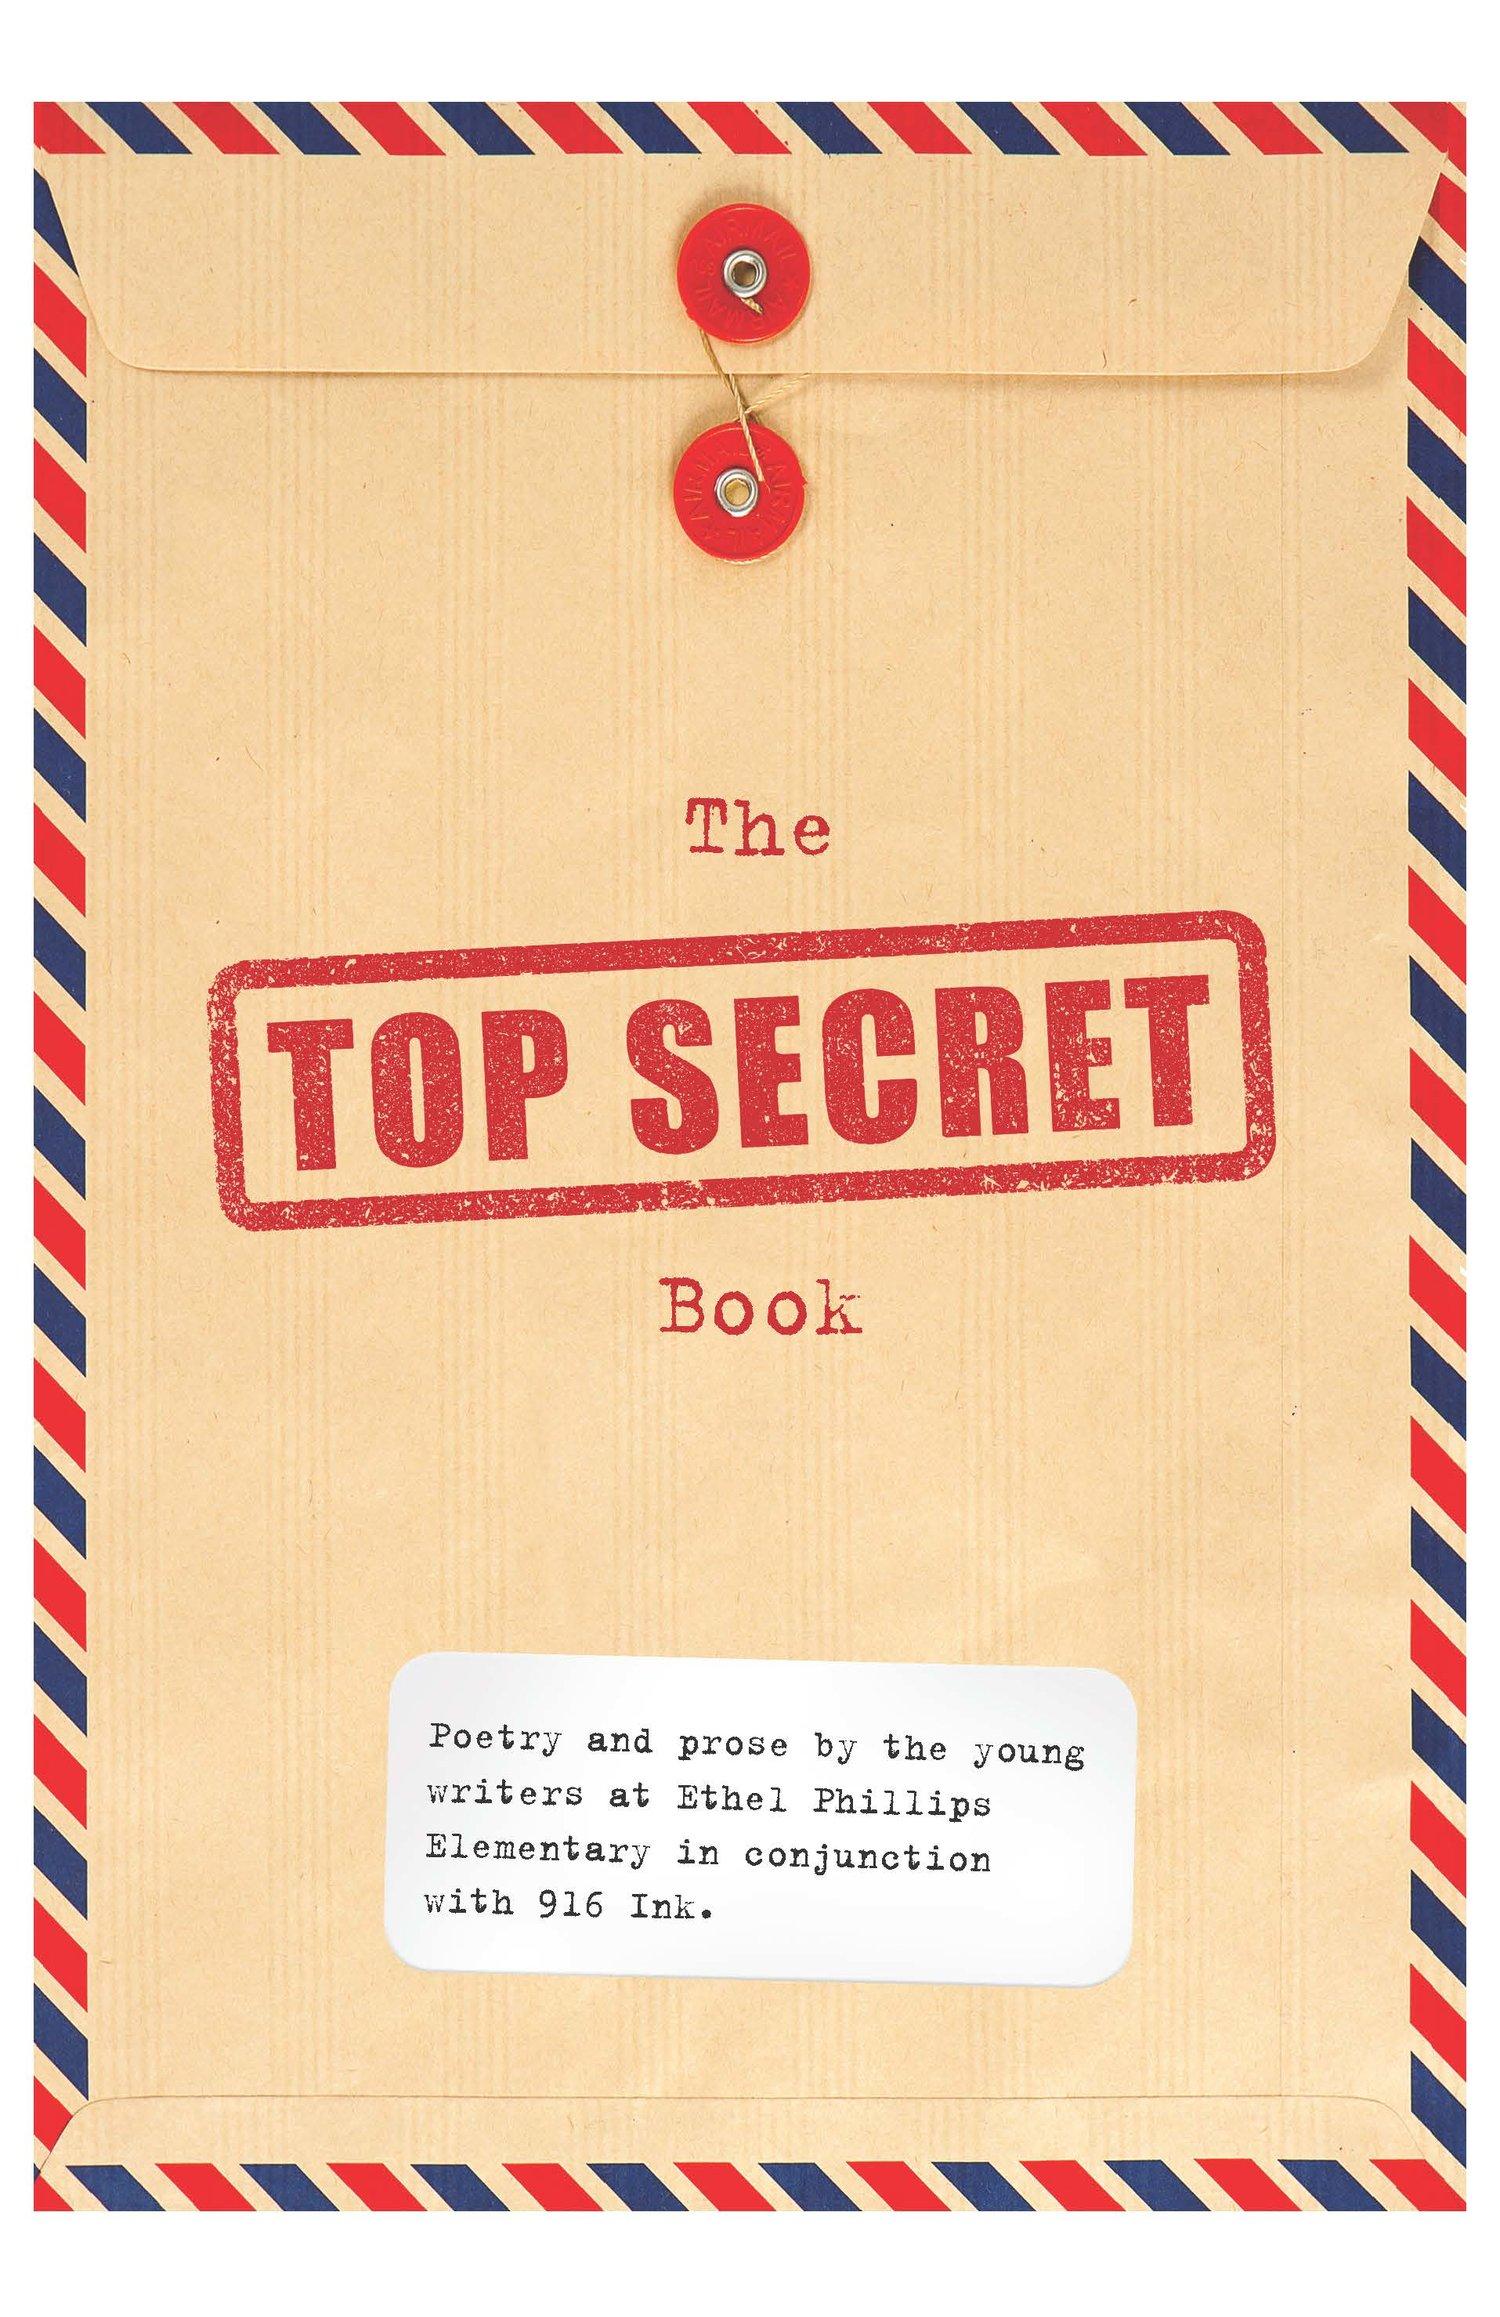 The Top Secret Book — 916 Ink